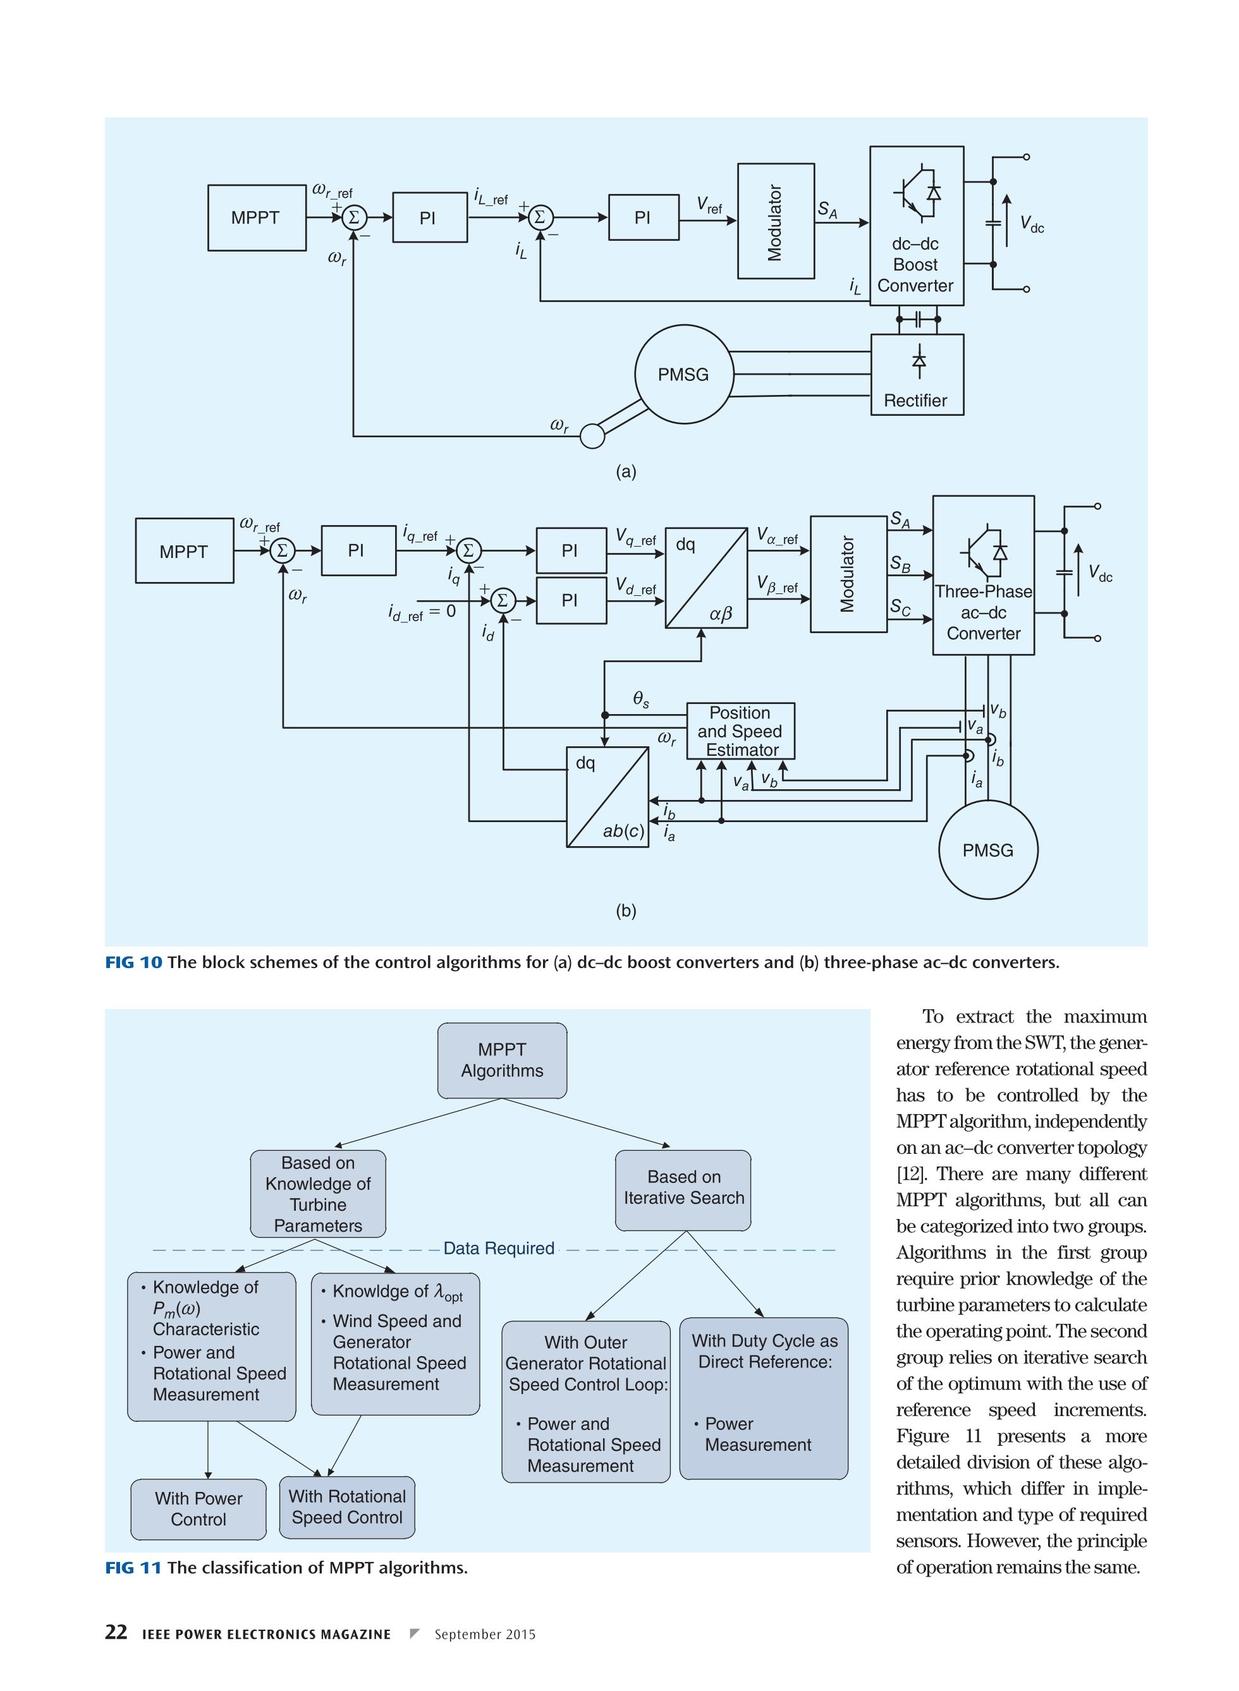 IEEE Power Electronics Magazine - September 2015